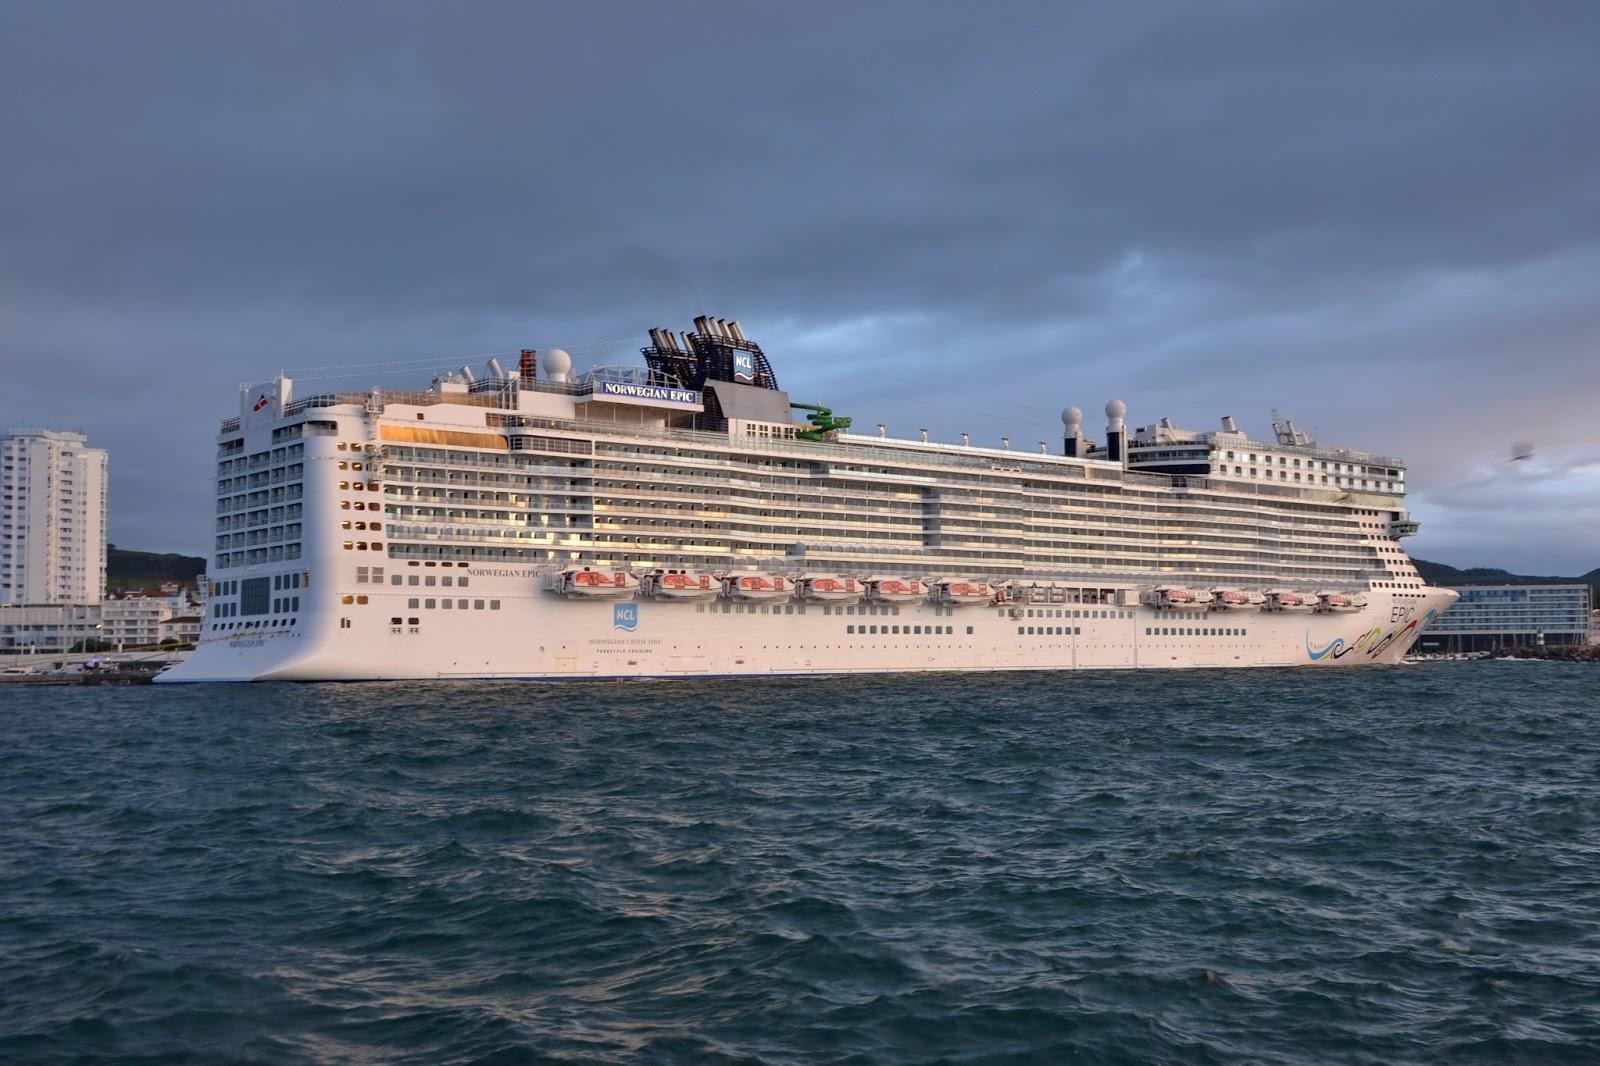 Azores Cruise Club Cruzeiros Nos A 231 Ores Norwegian Epic De Regresso A Ponta Delgada